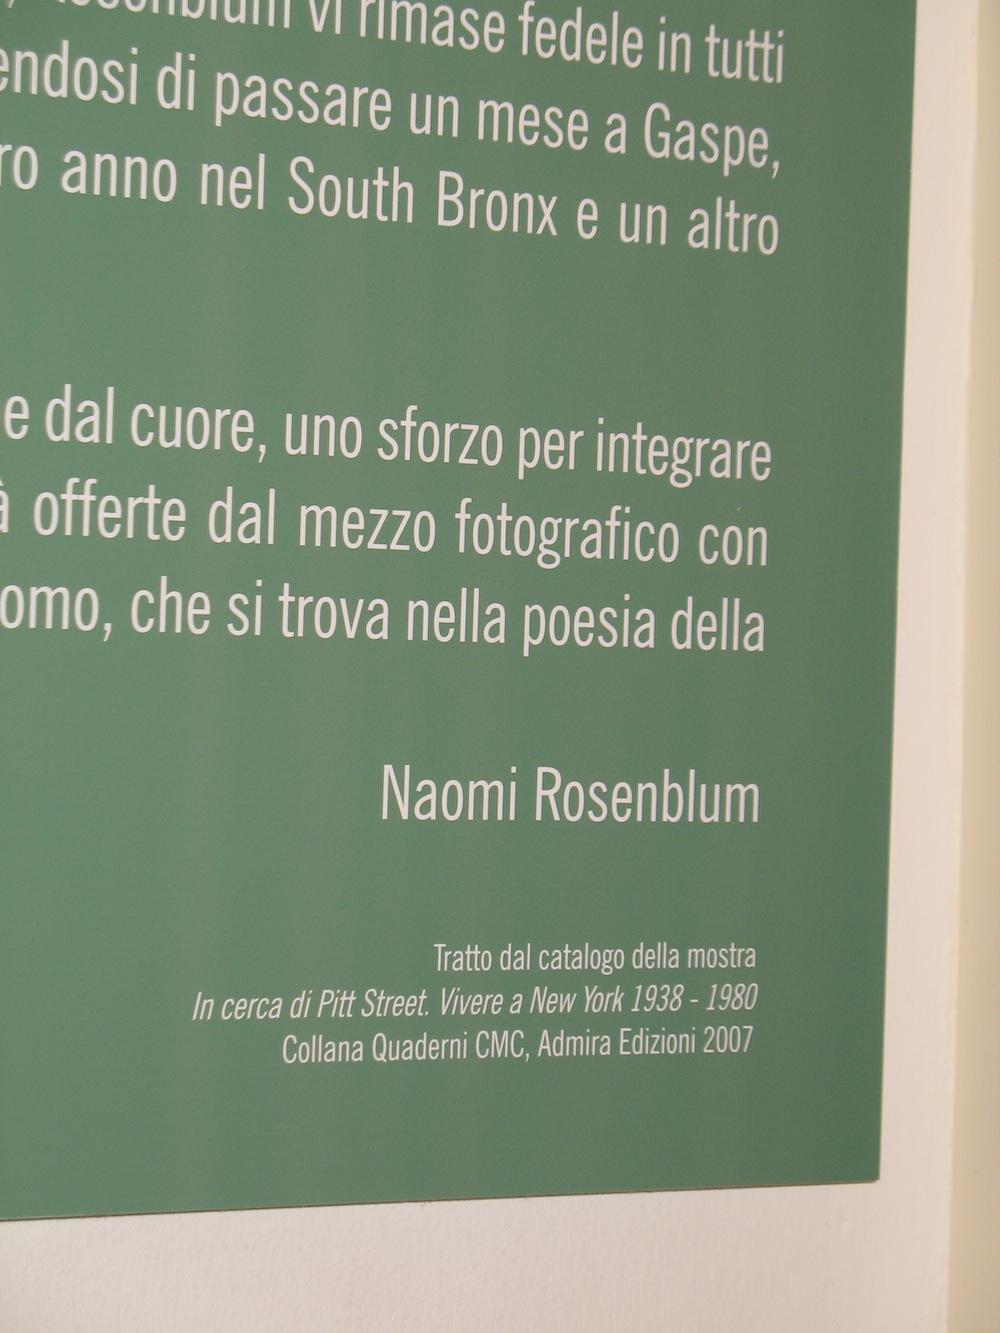 Title Wall by Naomi Rosenblum